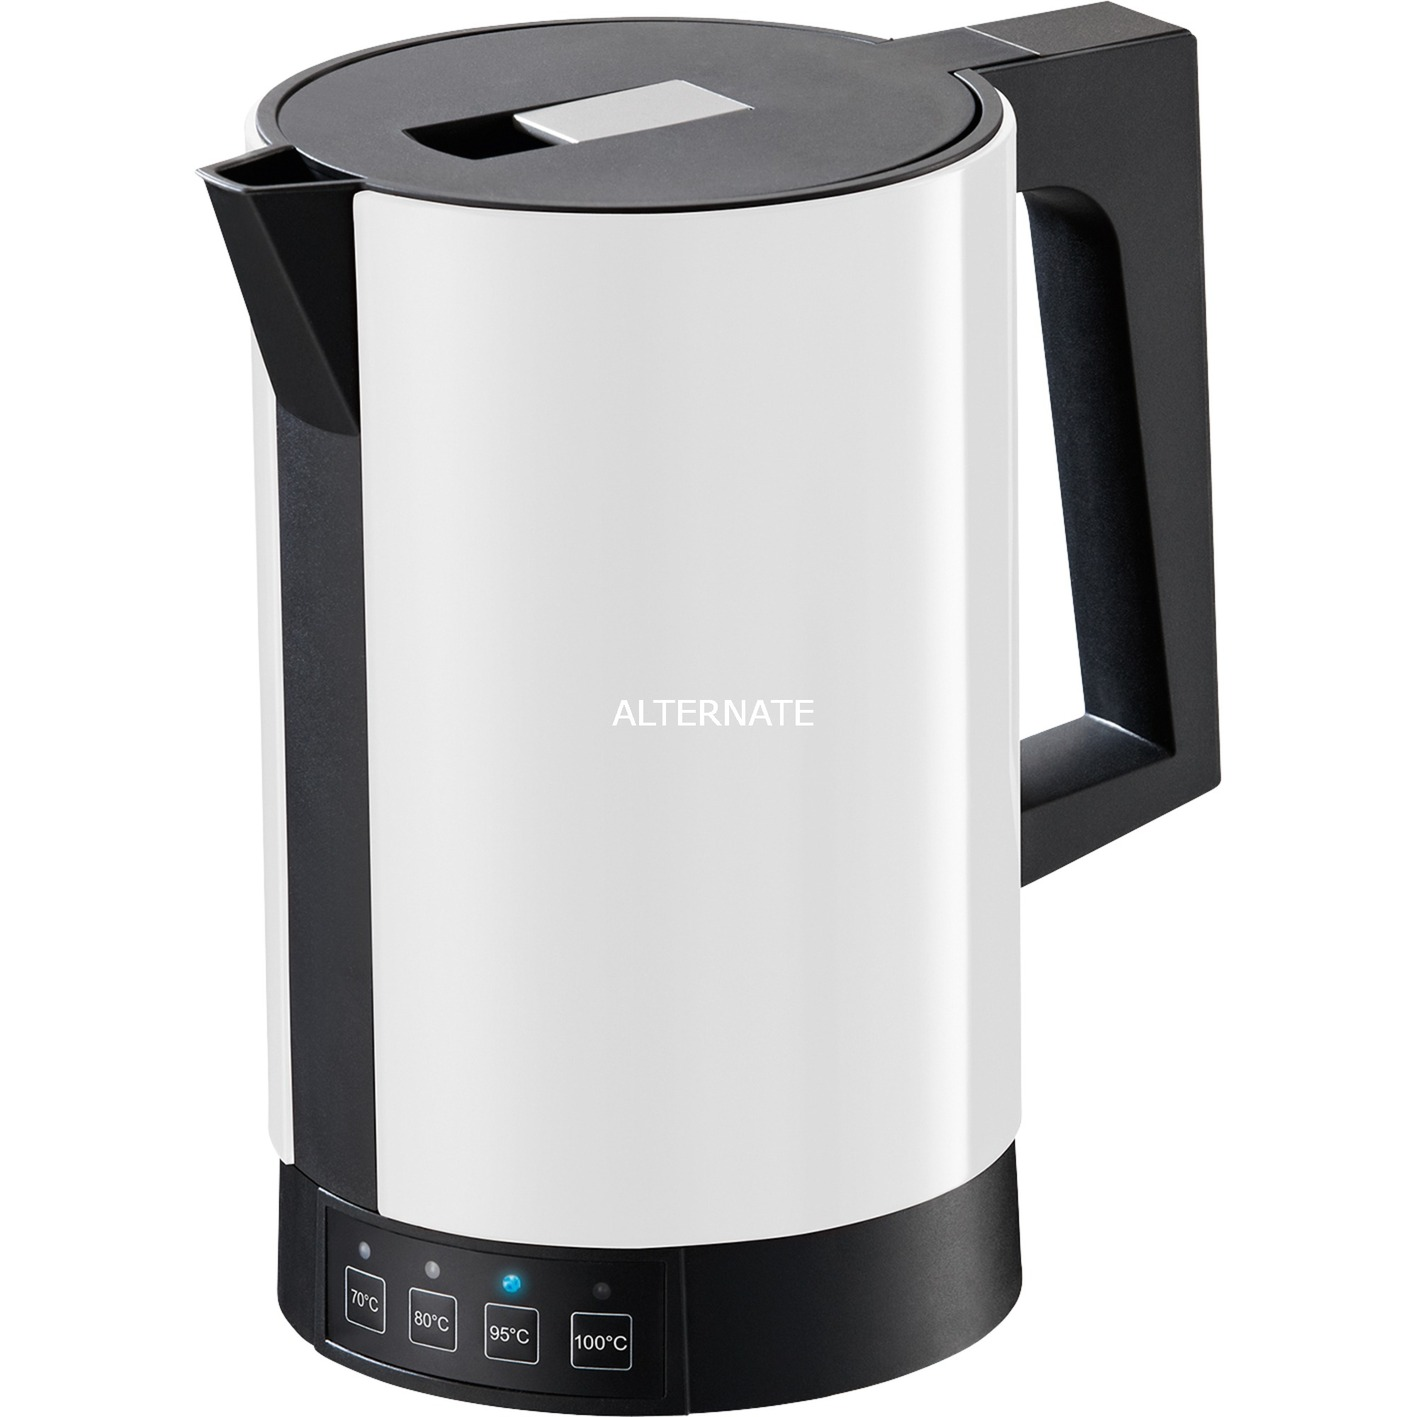 fontana5 tetera eléctrica 1,1 L Blanco 2800 W, Hervidor de agua